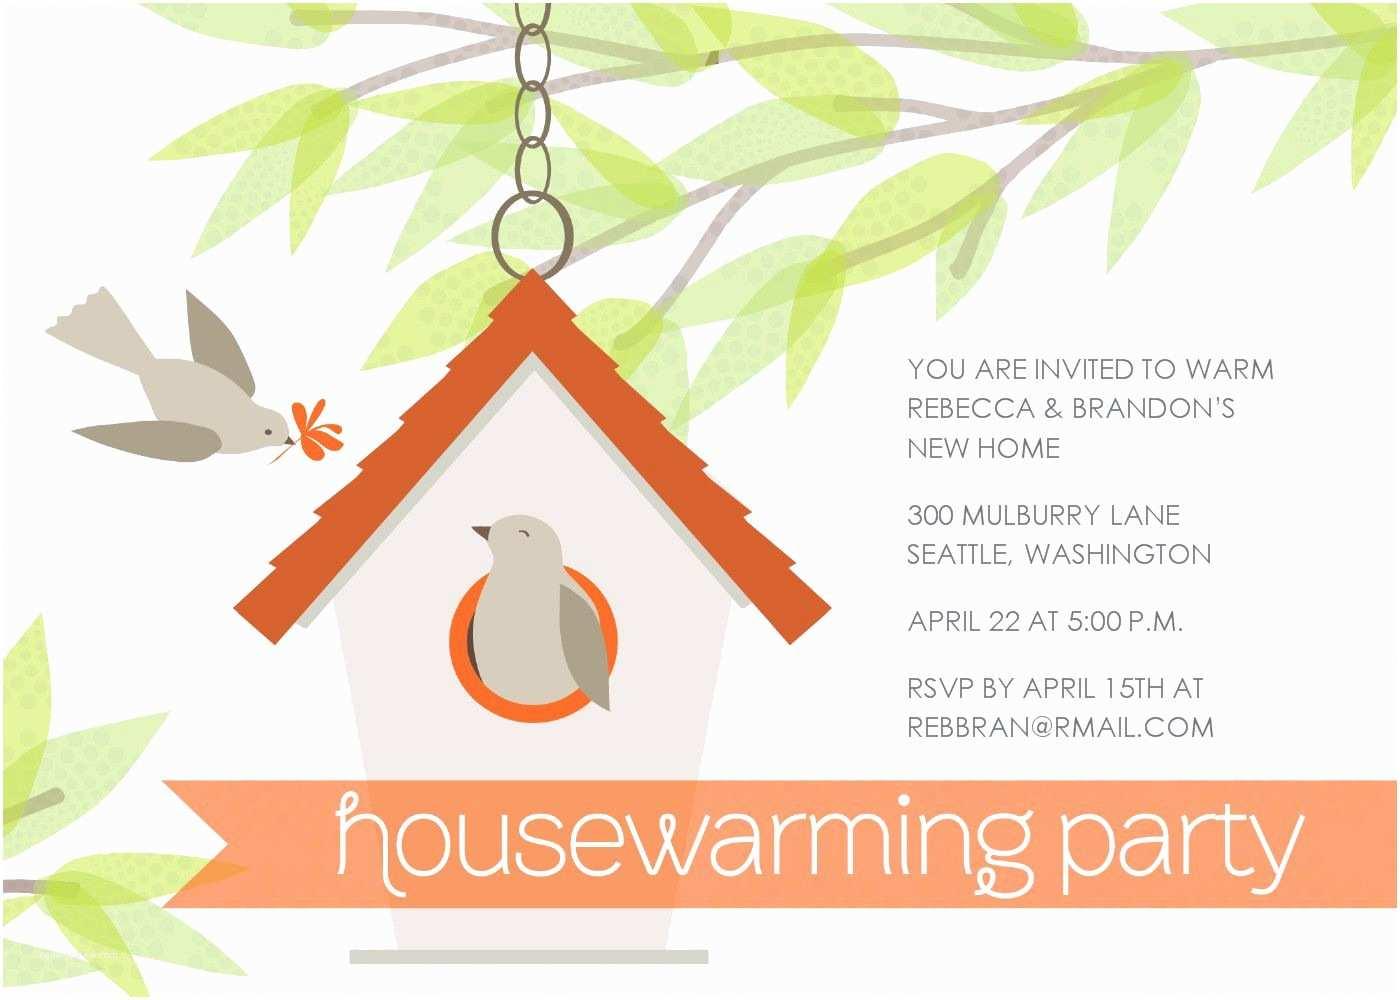 Housewarming Party Invitation Wording Housewarming Invitations Cards Housewarming Invitation